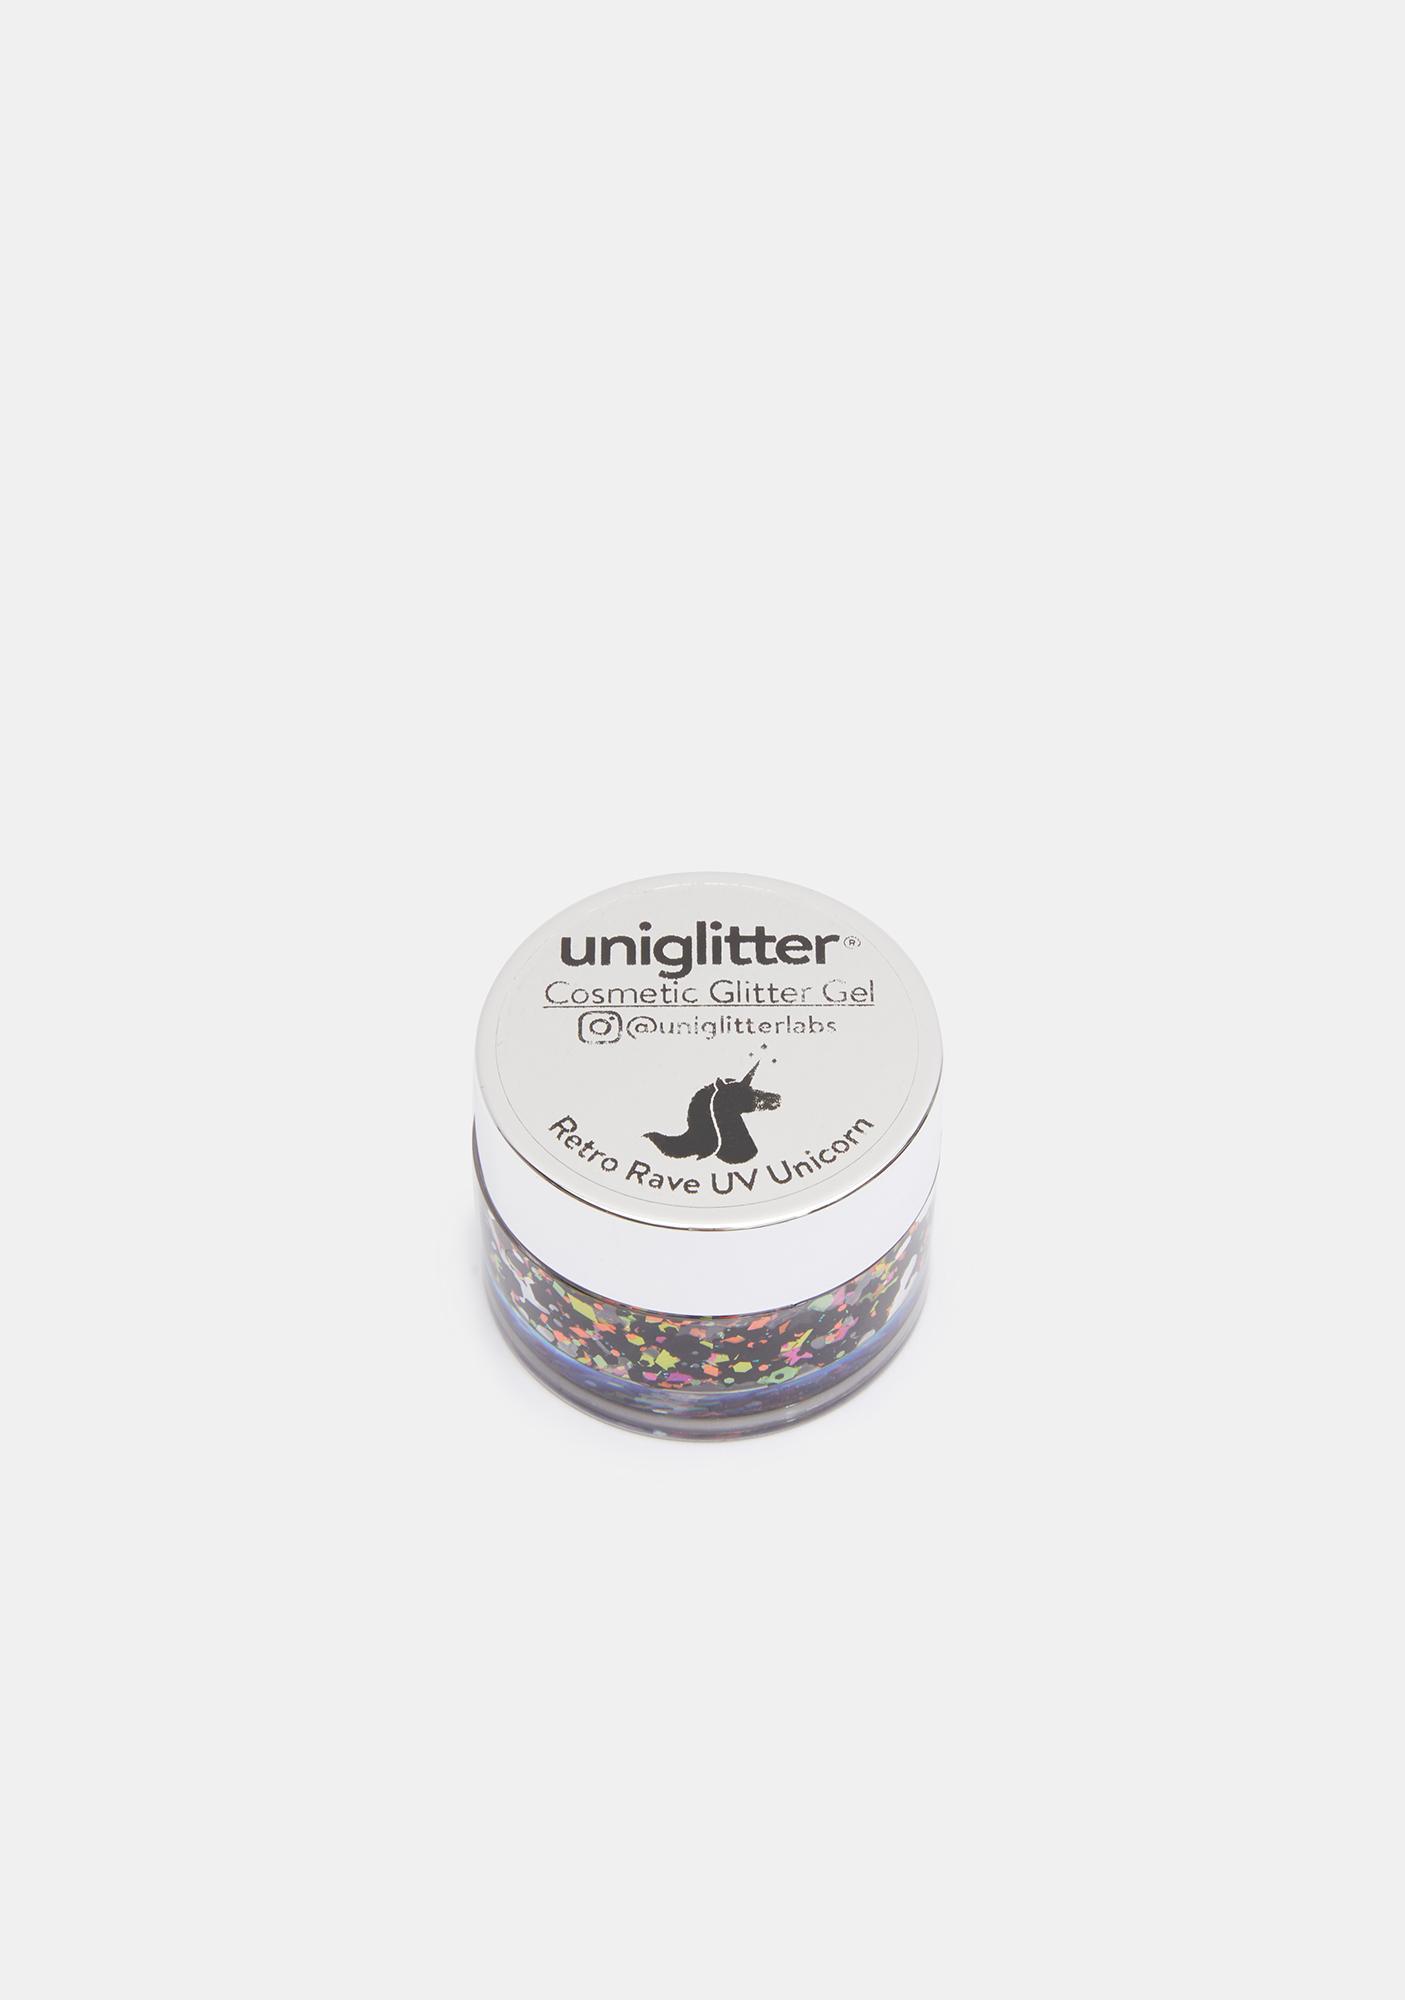 Uniglitter Retro Rave UV Unicorn Glitter Gel